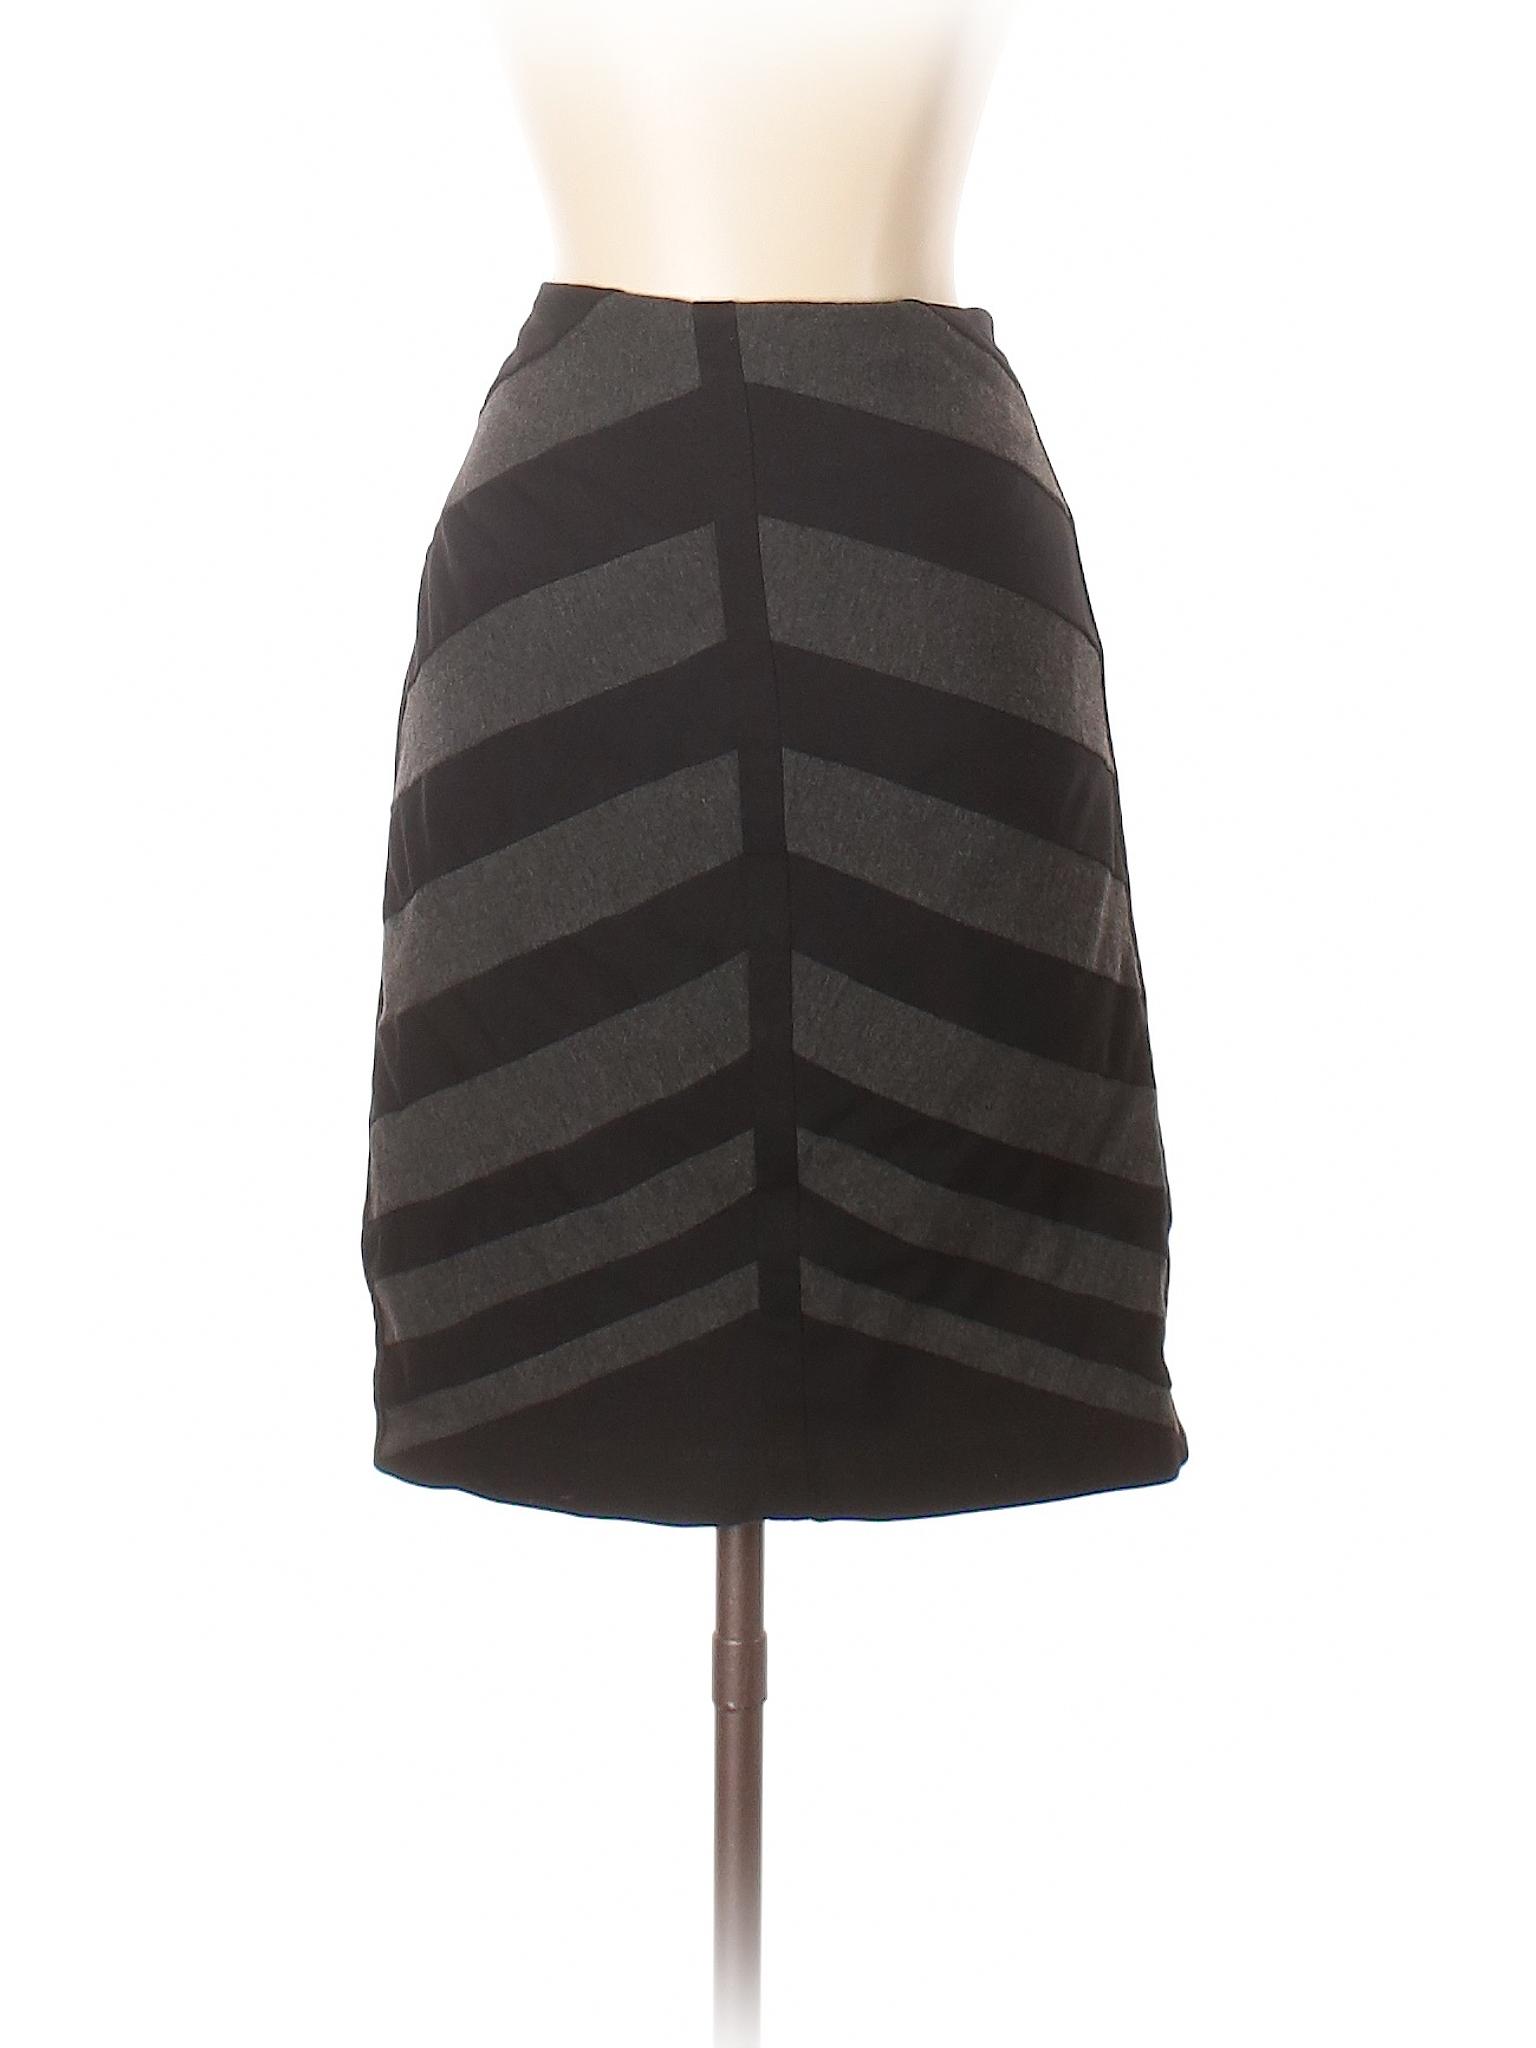 White House winter Casual Market Black Skirt Leisure 5PfnqAwvEA